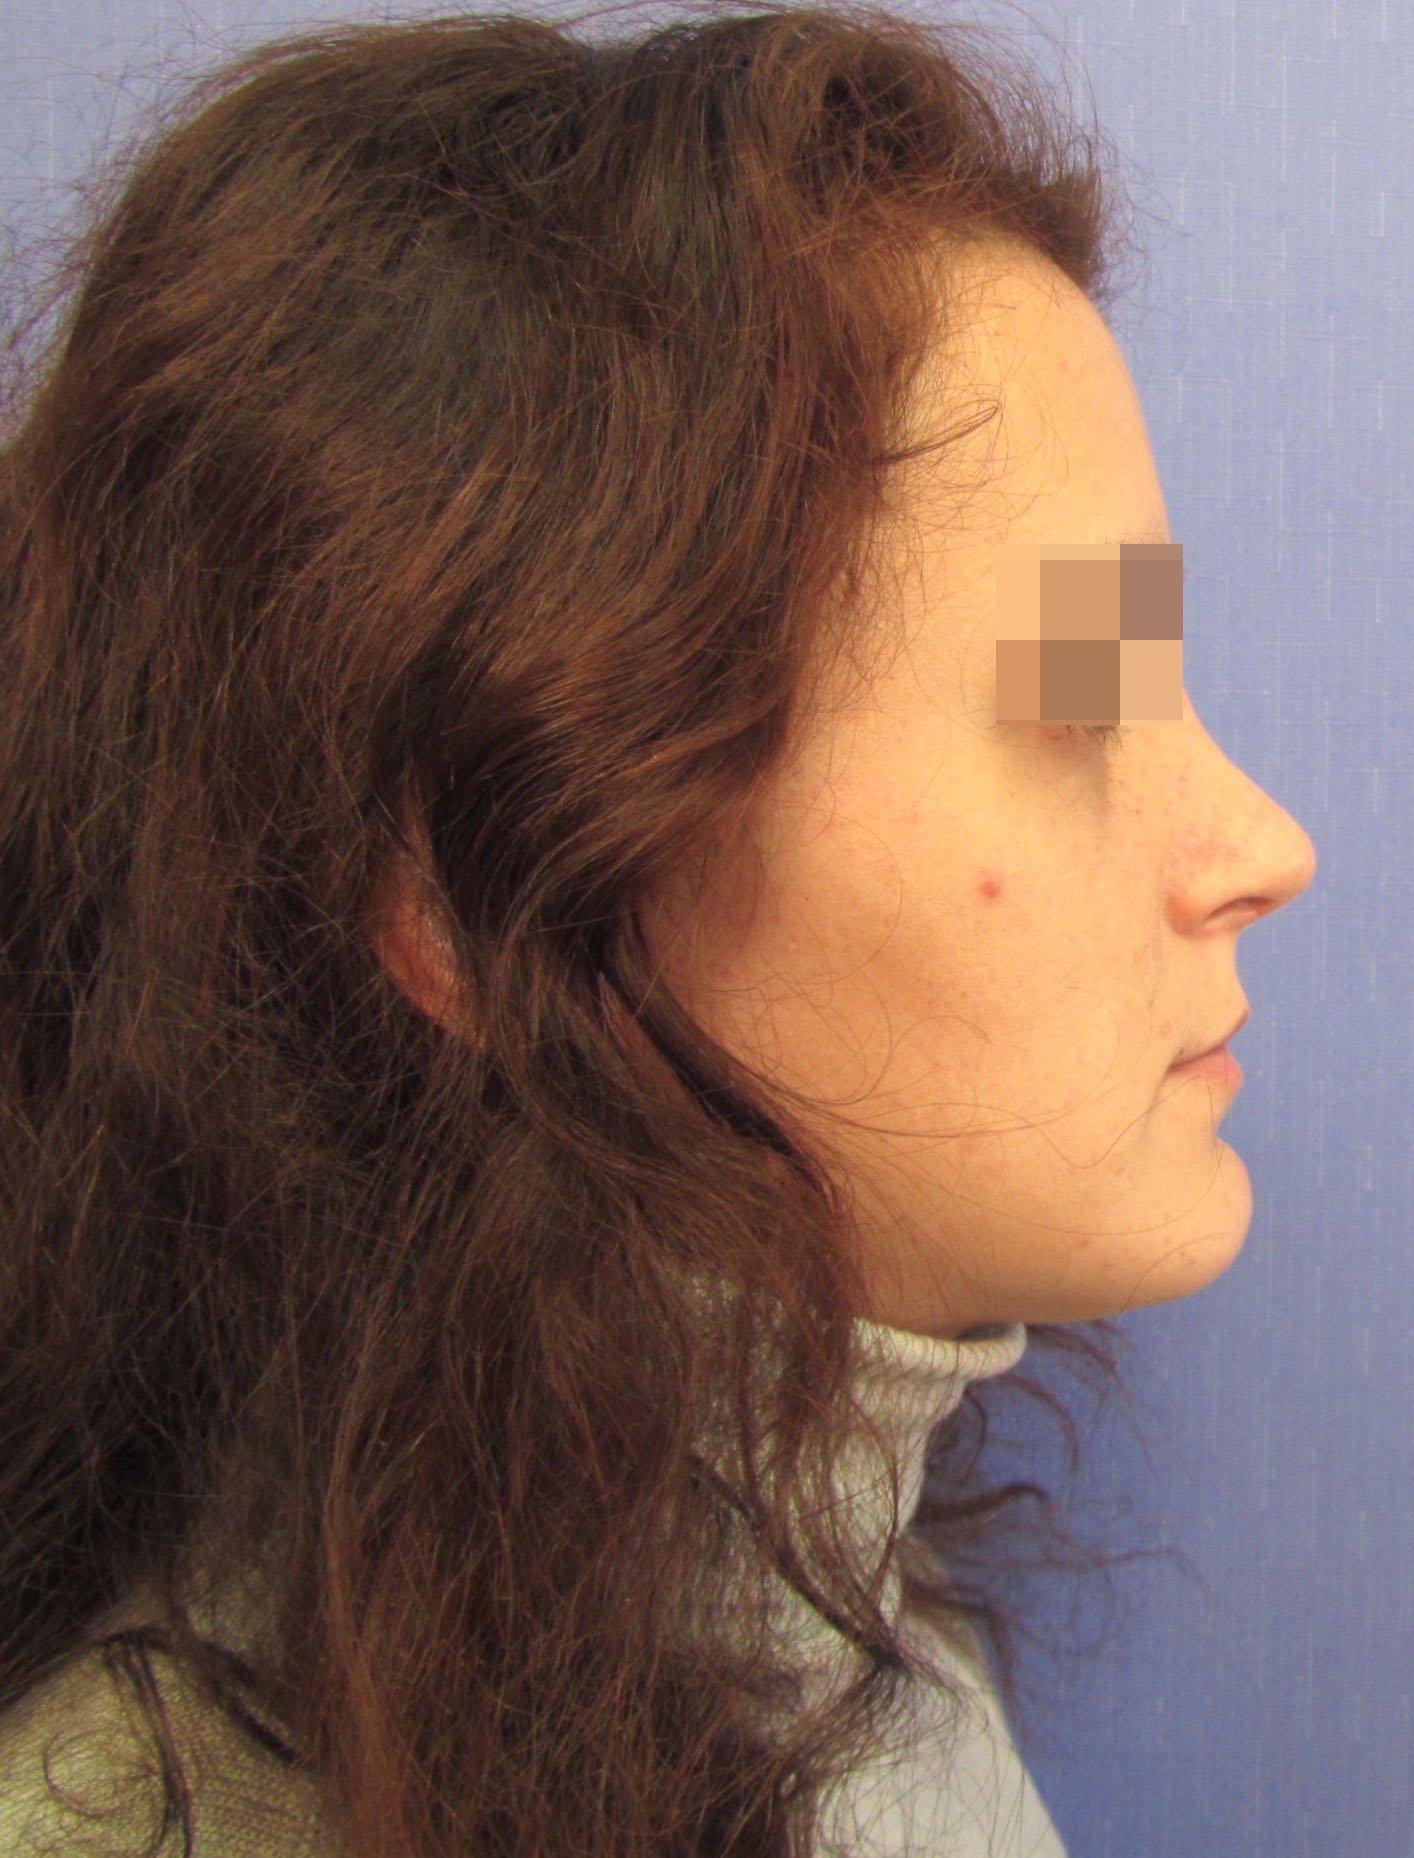 Ринопластика широкого кончика носа отзывы